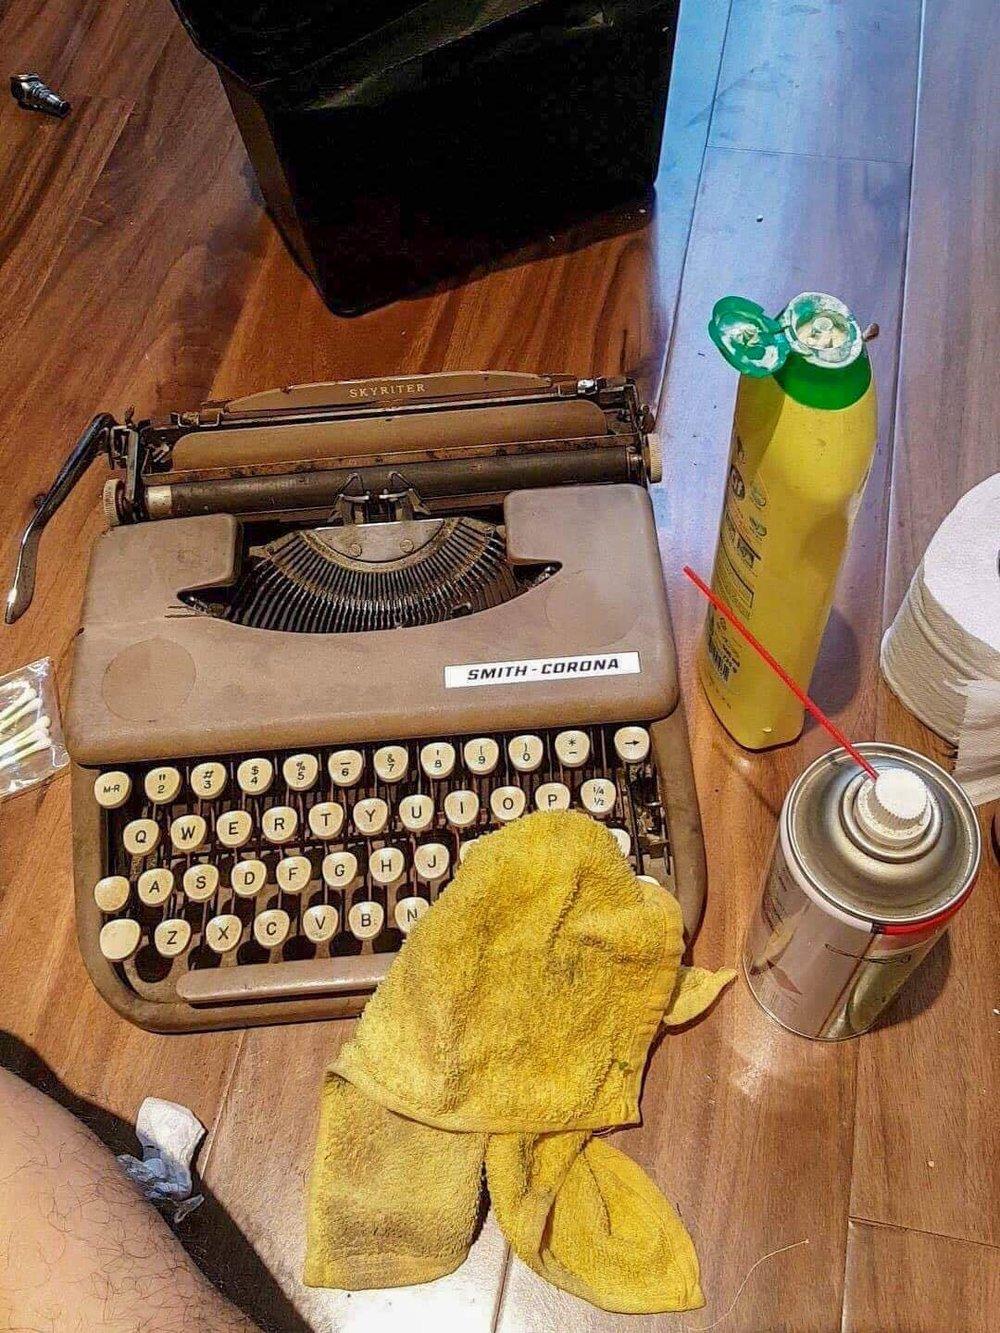 jellykey-typewriter-artisan-keycap-2-2.jpg